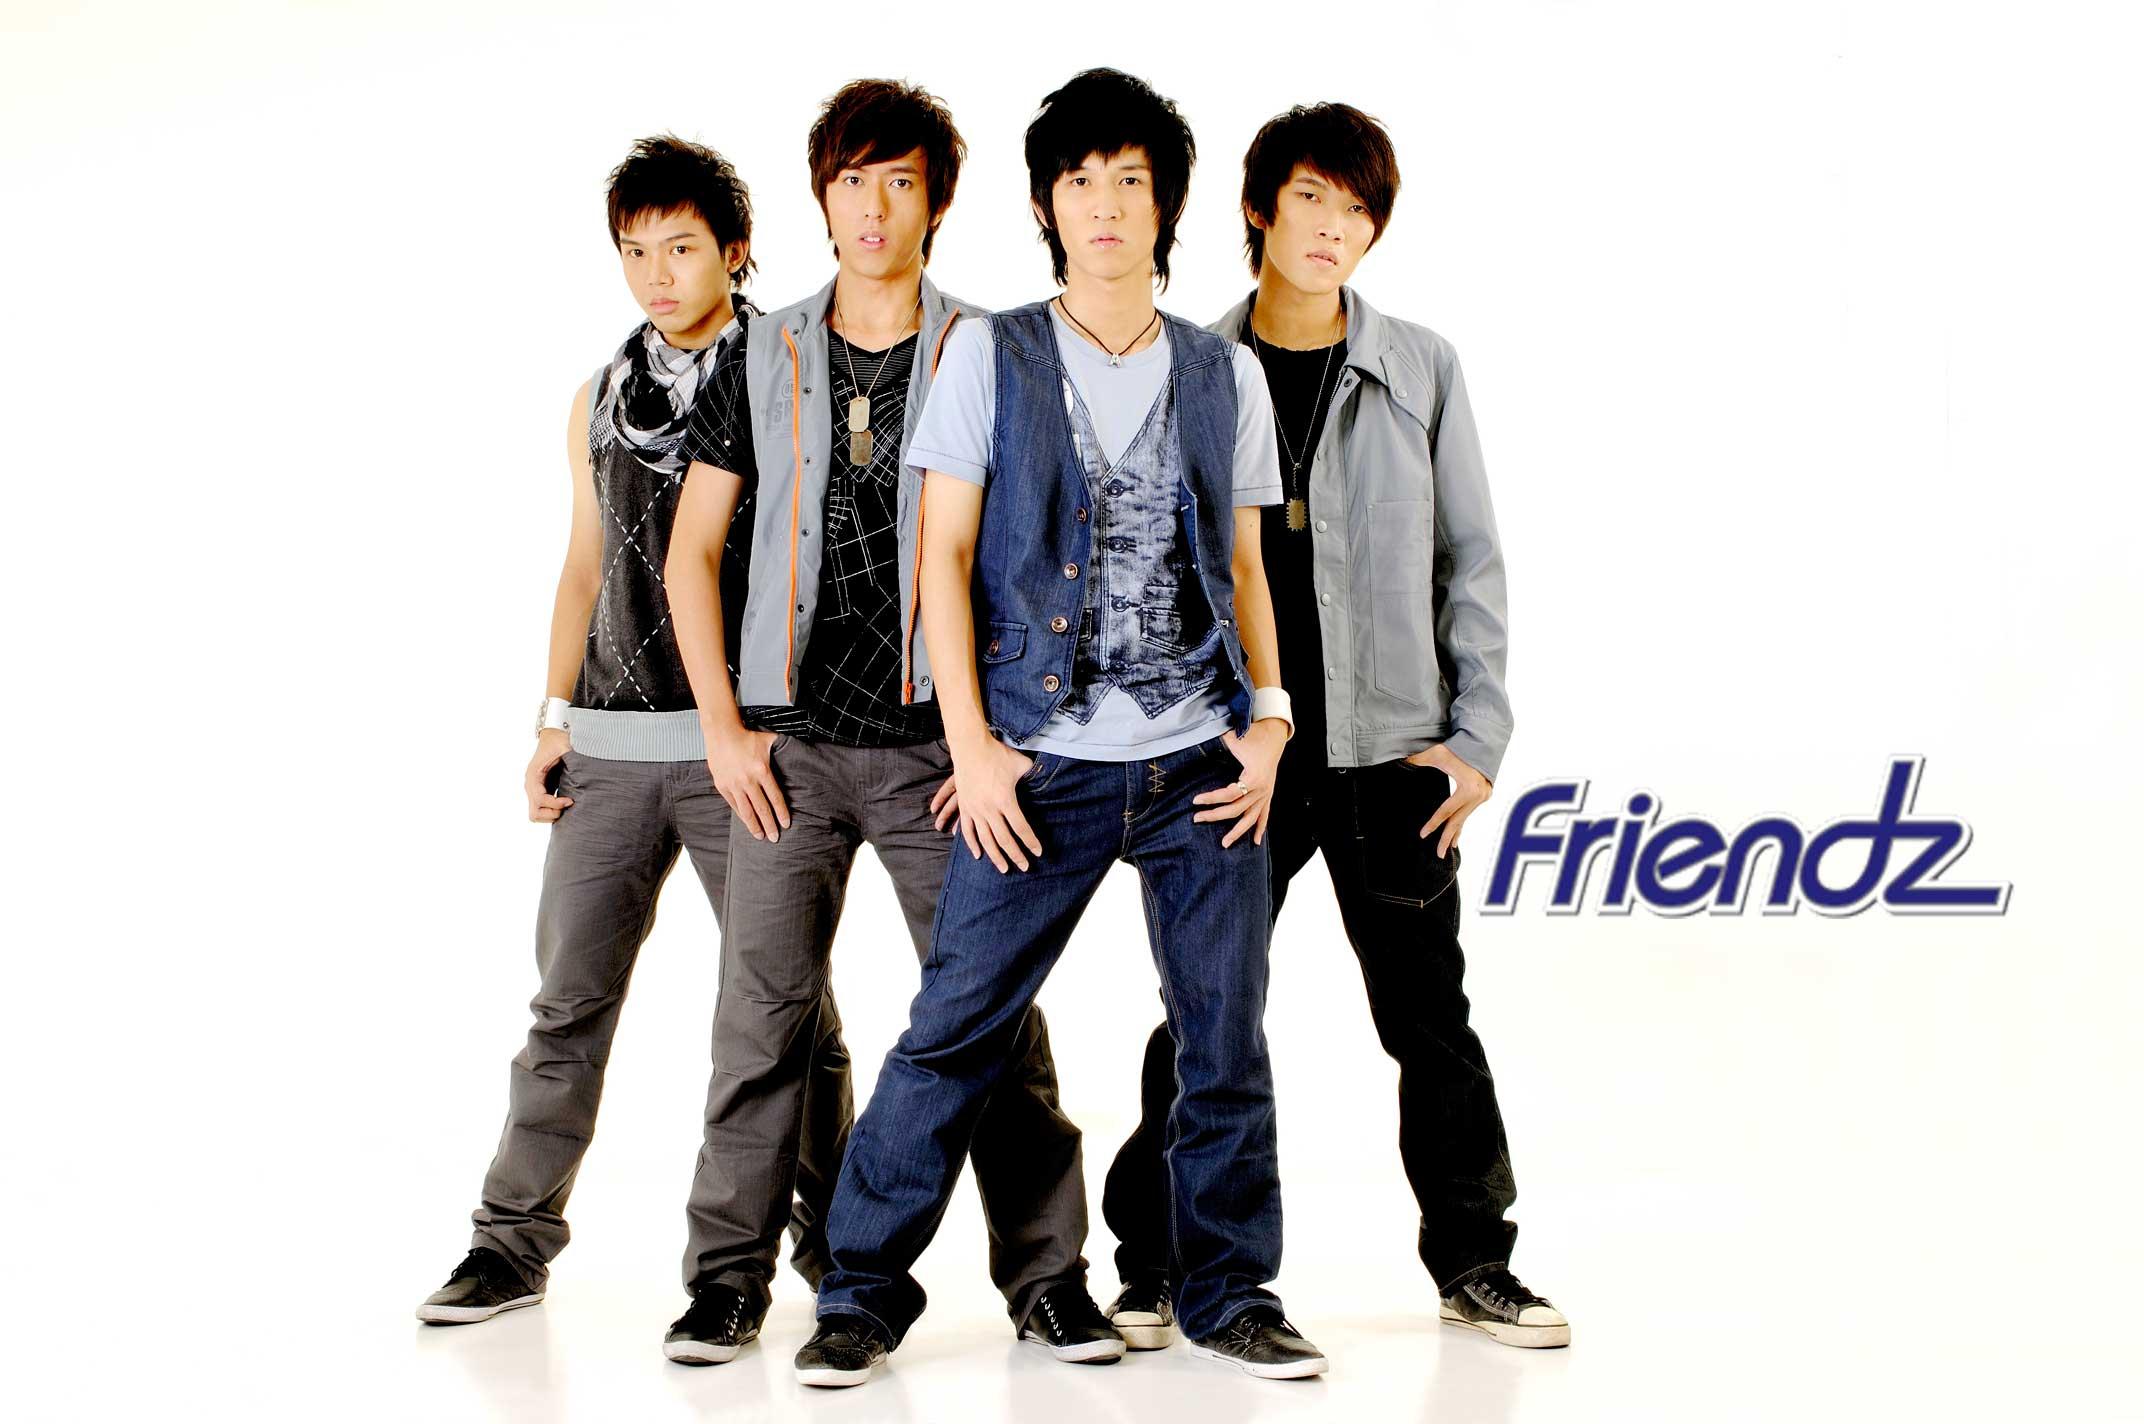 friendz1.jpg